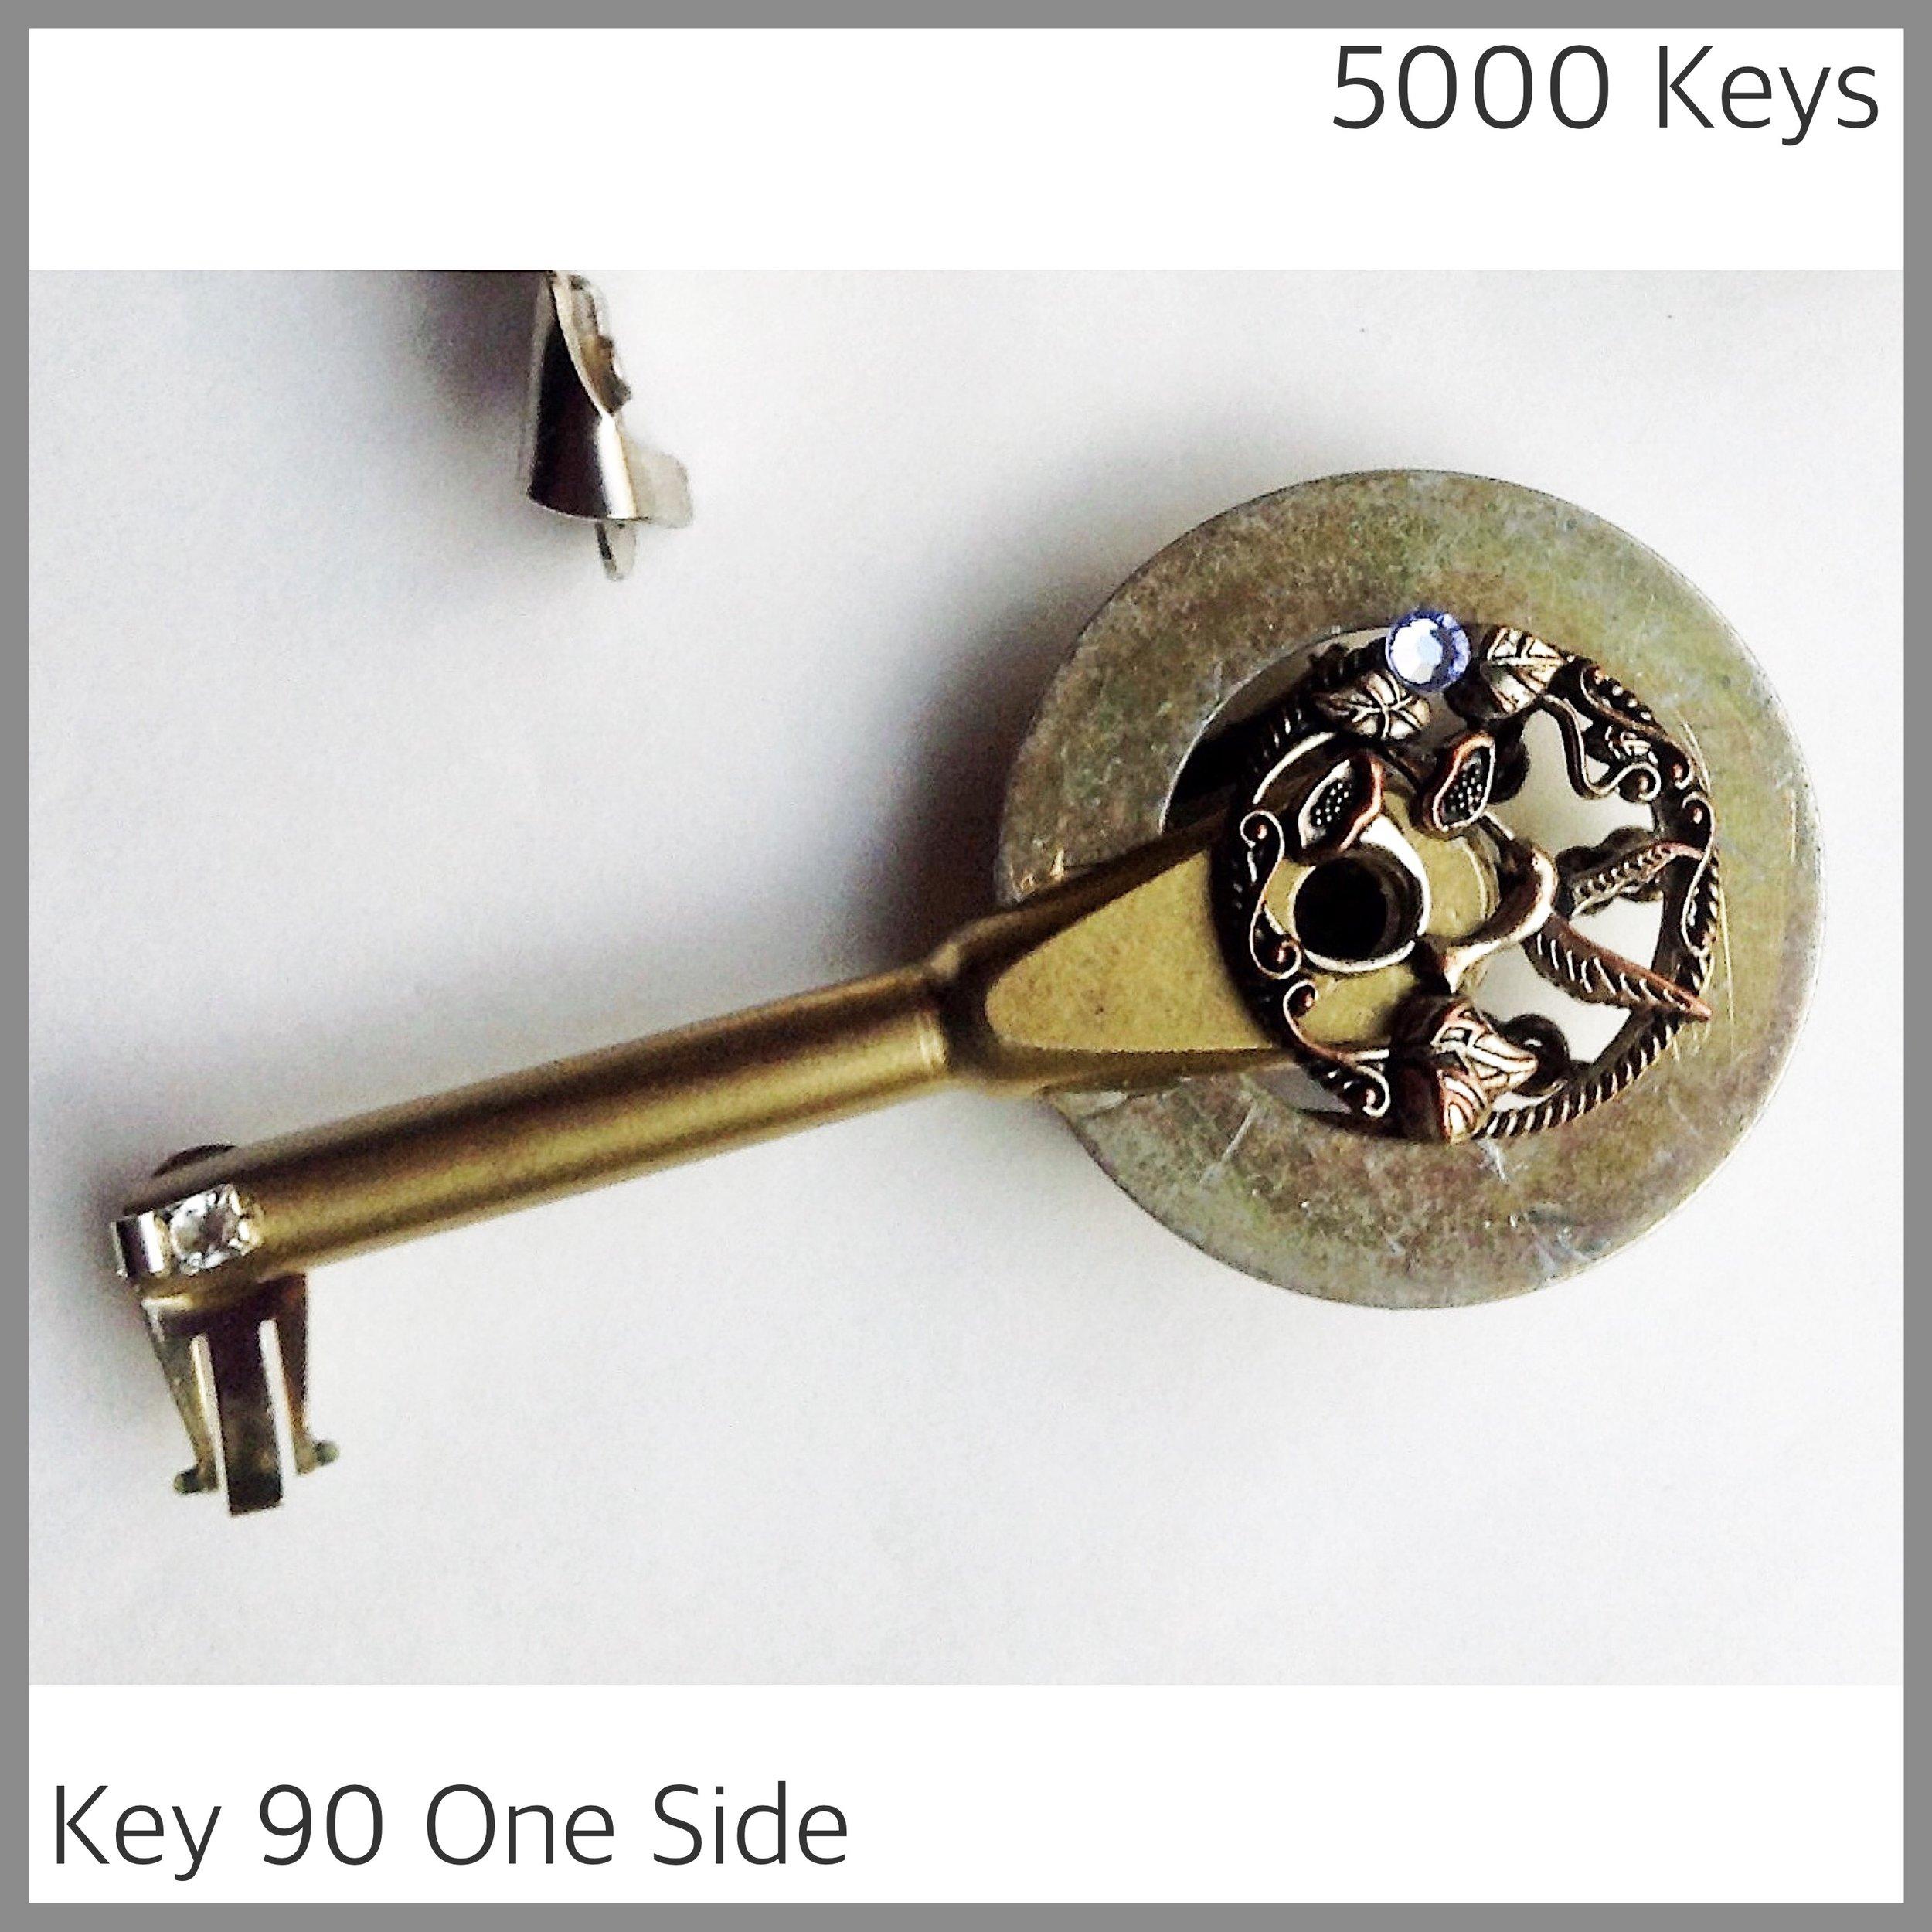 Key 90 one side.JPG